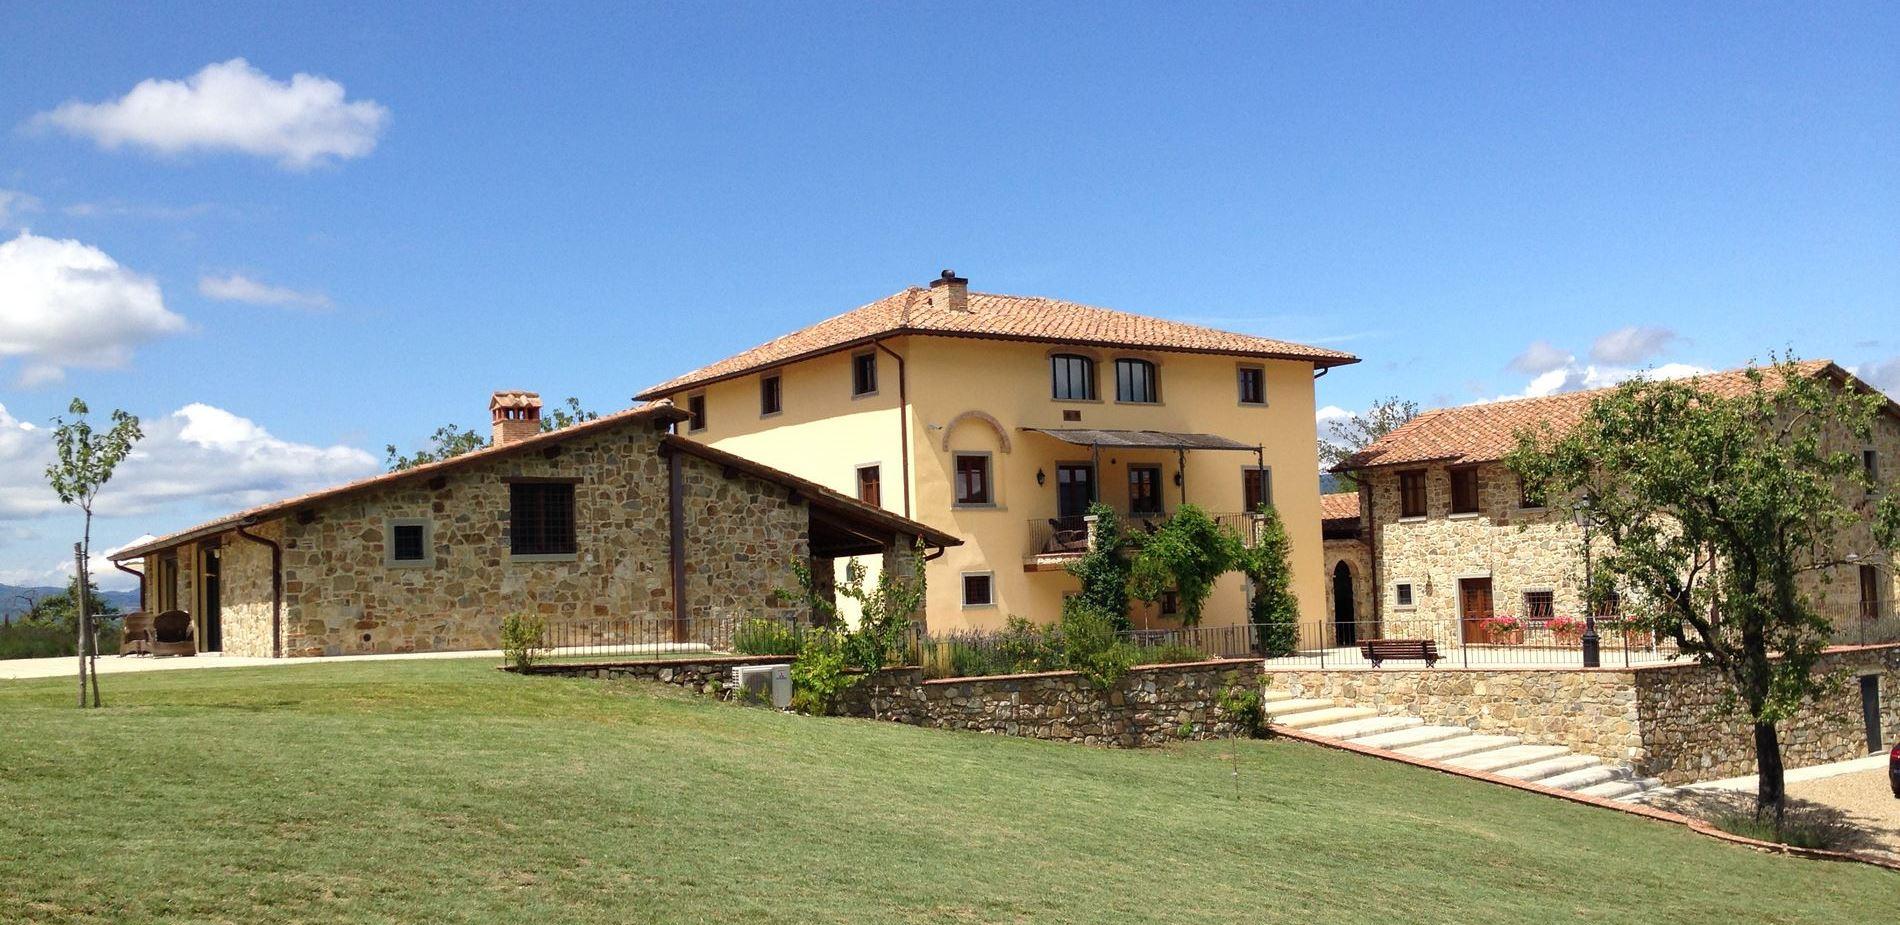 vakantiewoning vakantiehuis zwembad airco Toscane 10 8 6 4 persoons